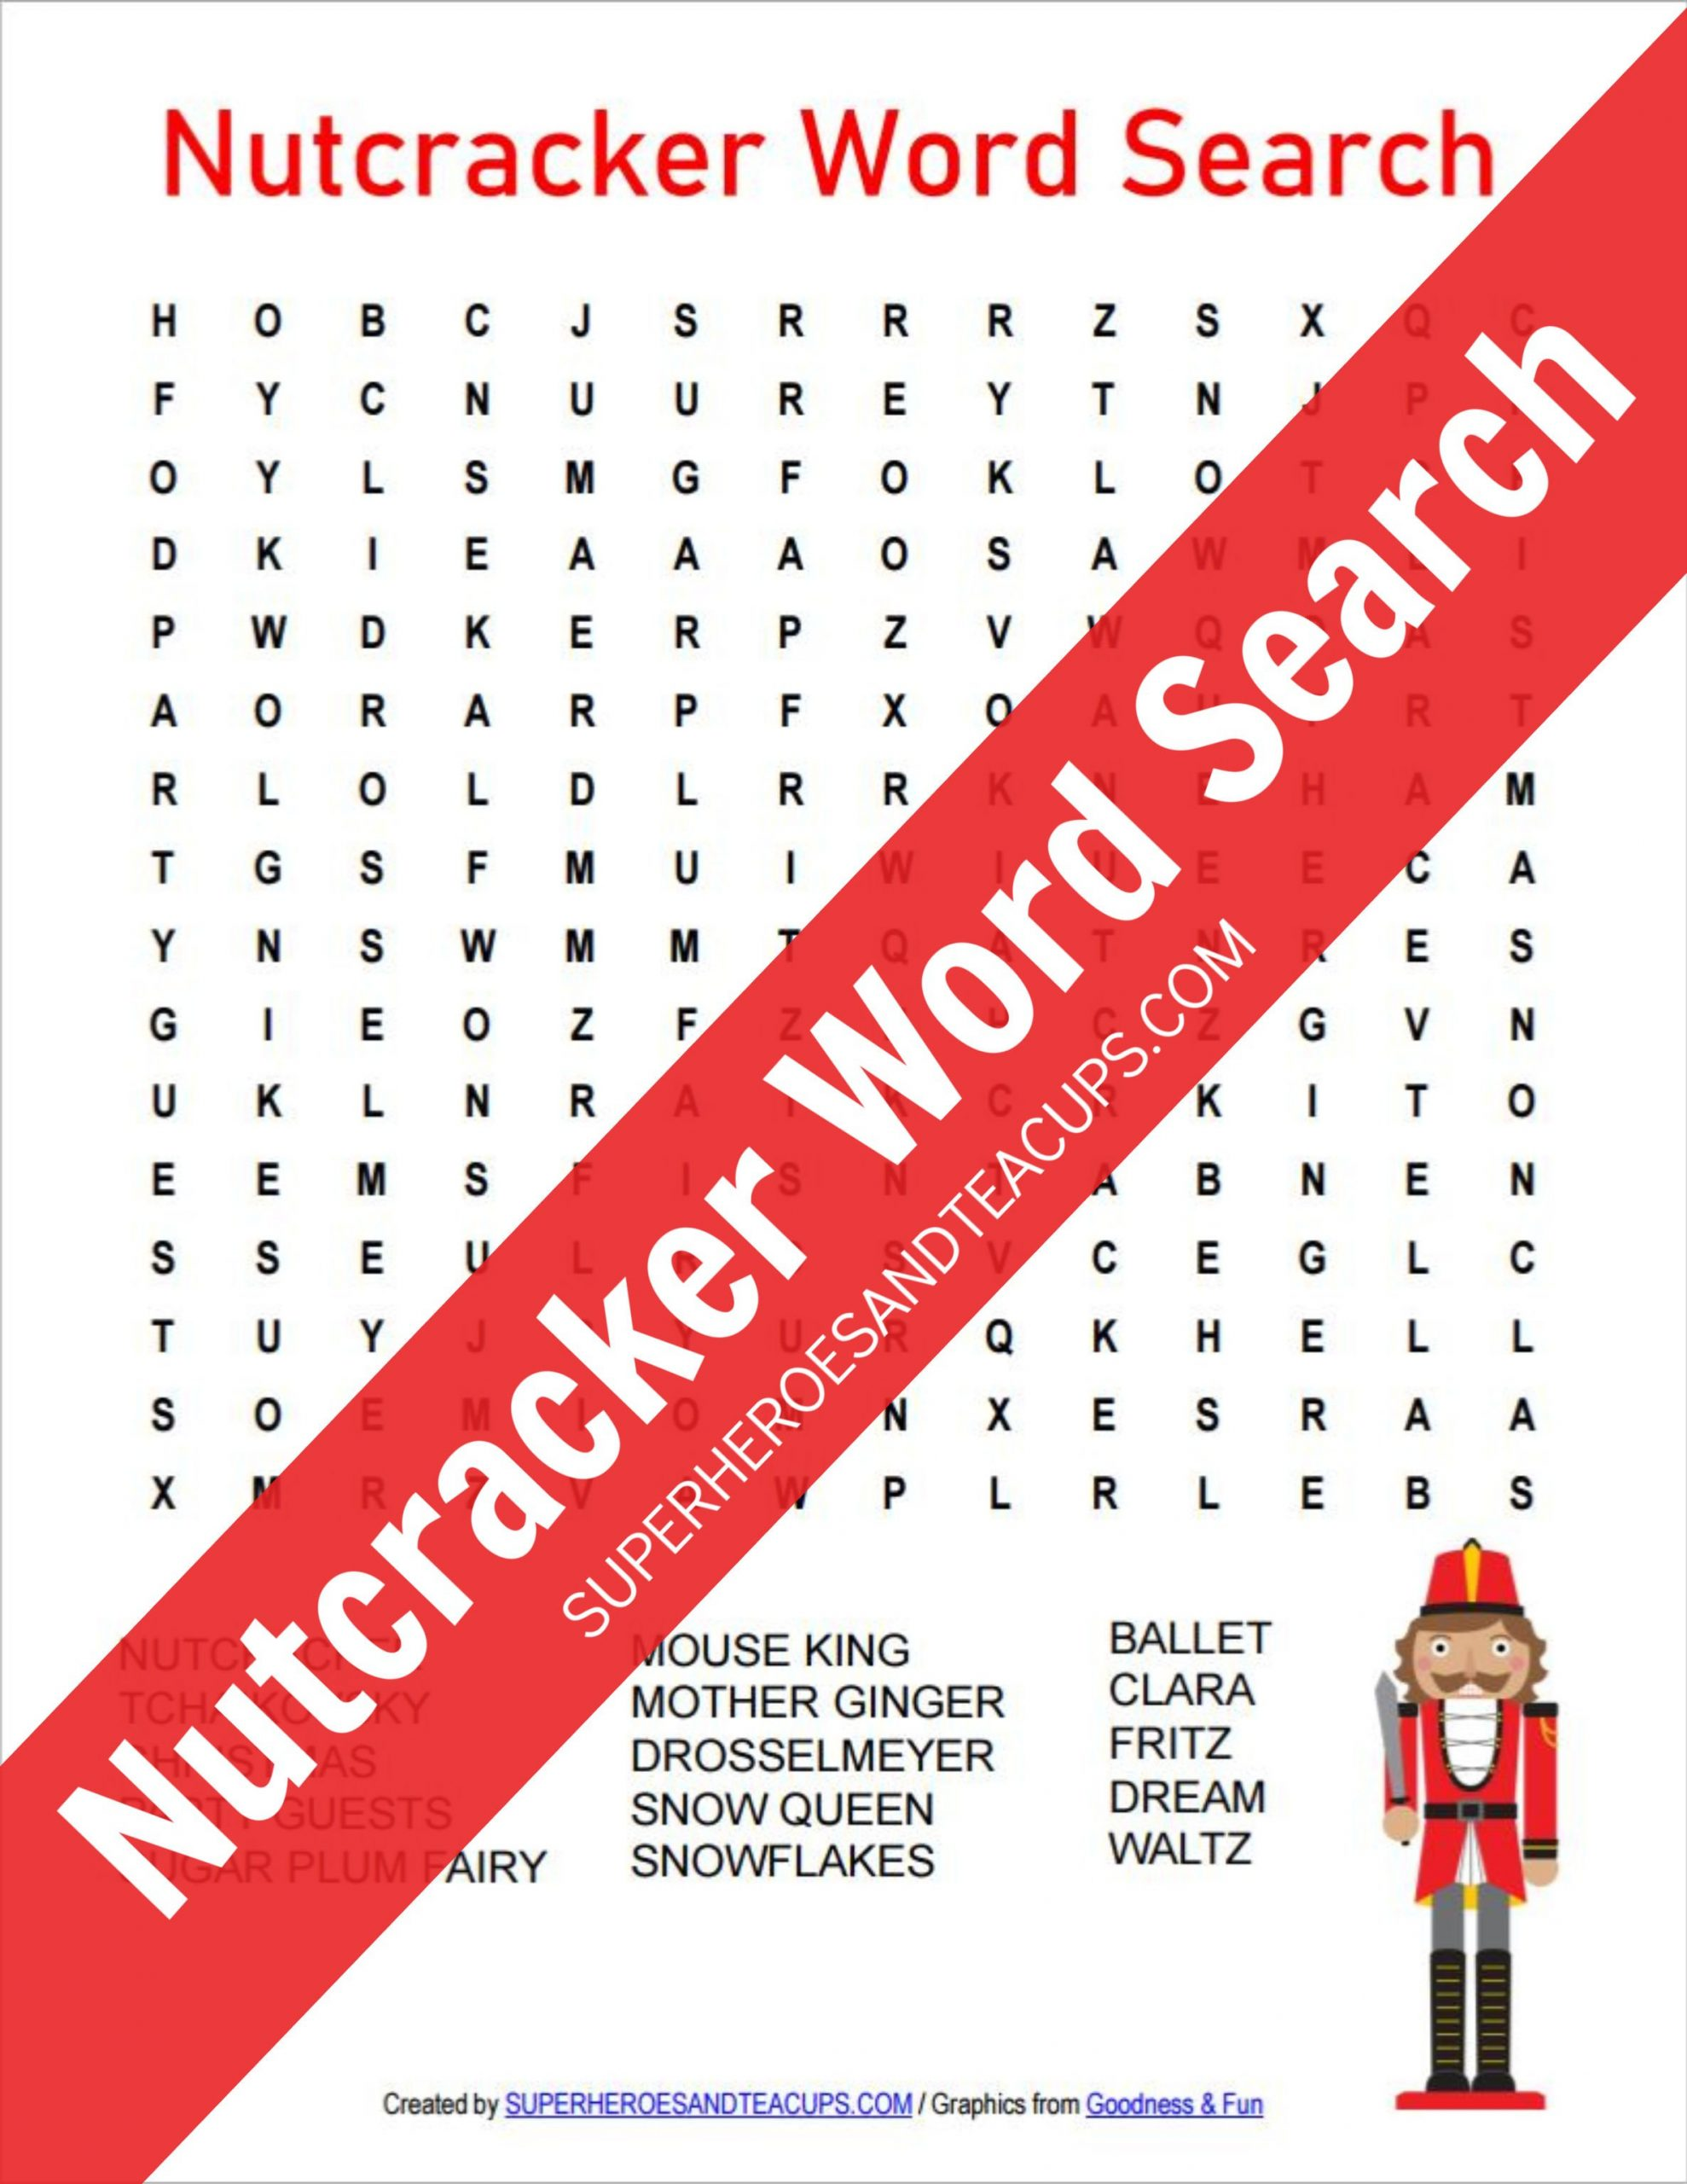 Nutcracker Word Search Free Printable | Superheroes And Teacups